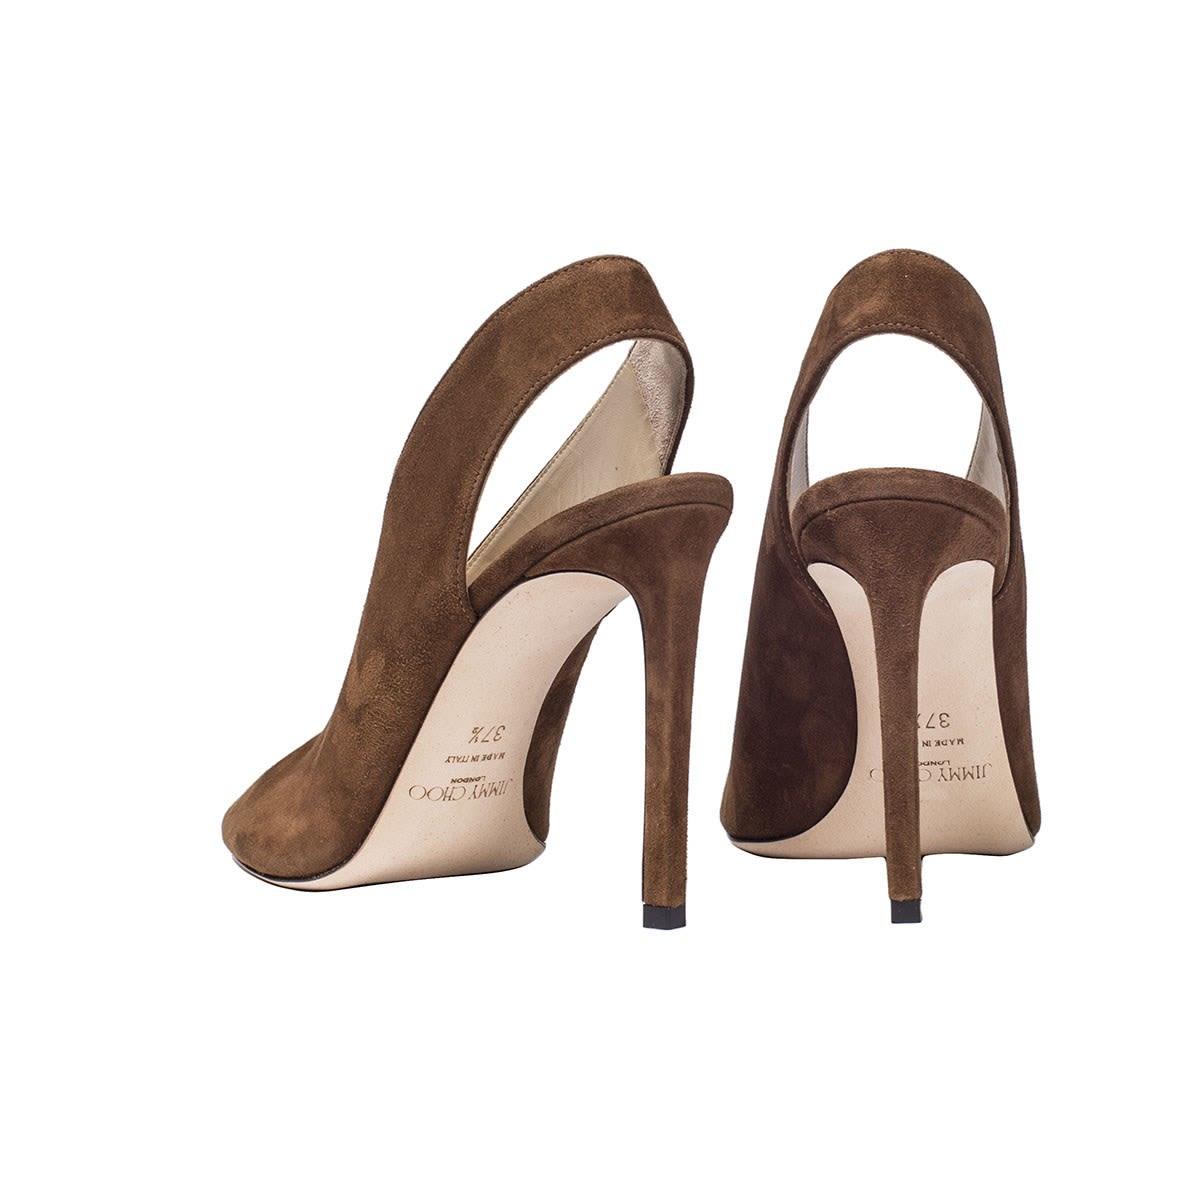 bb638cb62c8 ... Jimmy Choo Shar 100 Sandals